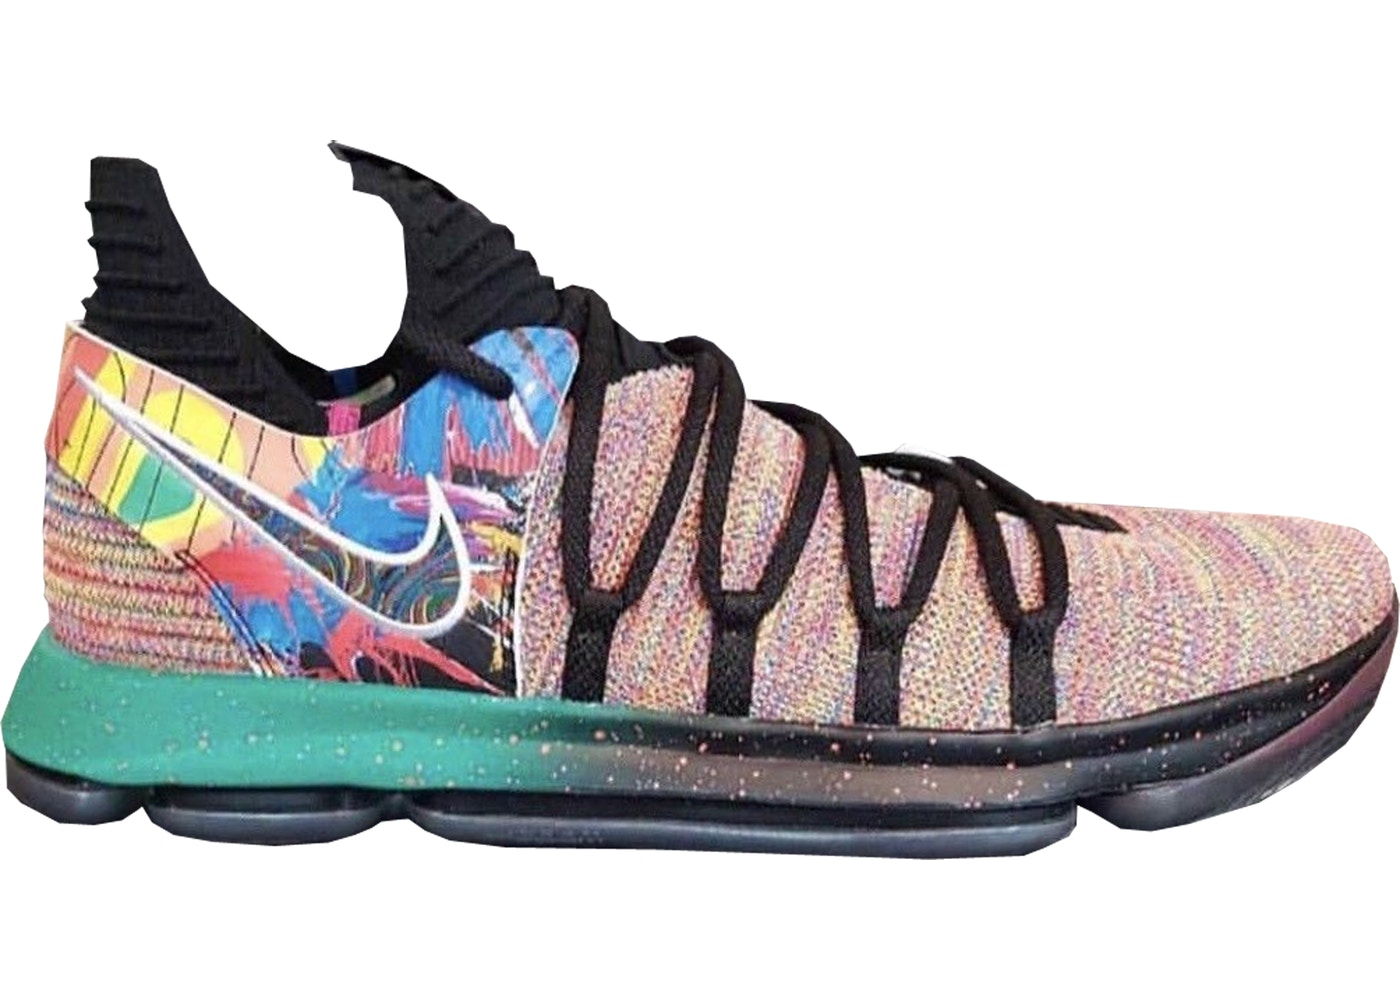 5e4e2a24ab55d Nike KD Shoes - Release Date